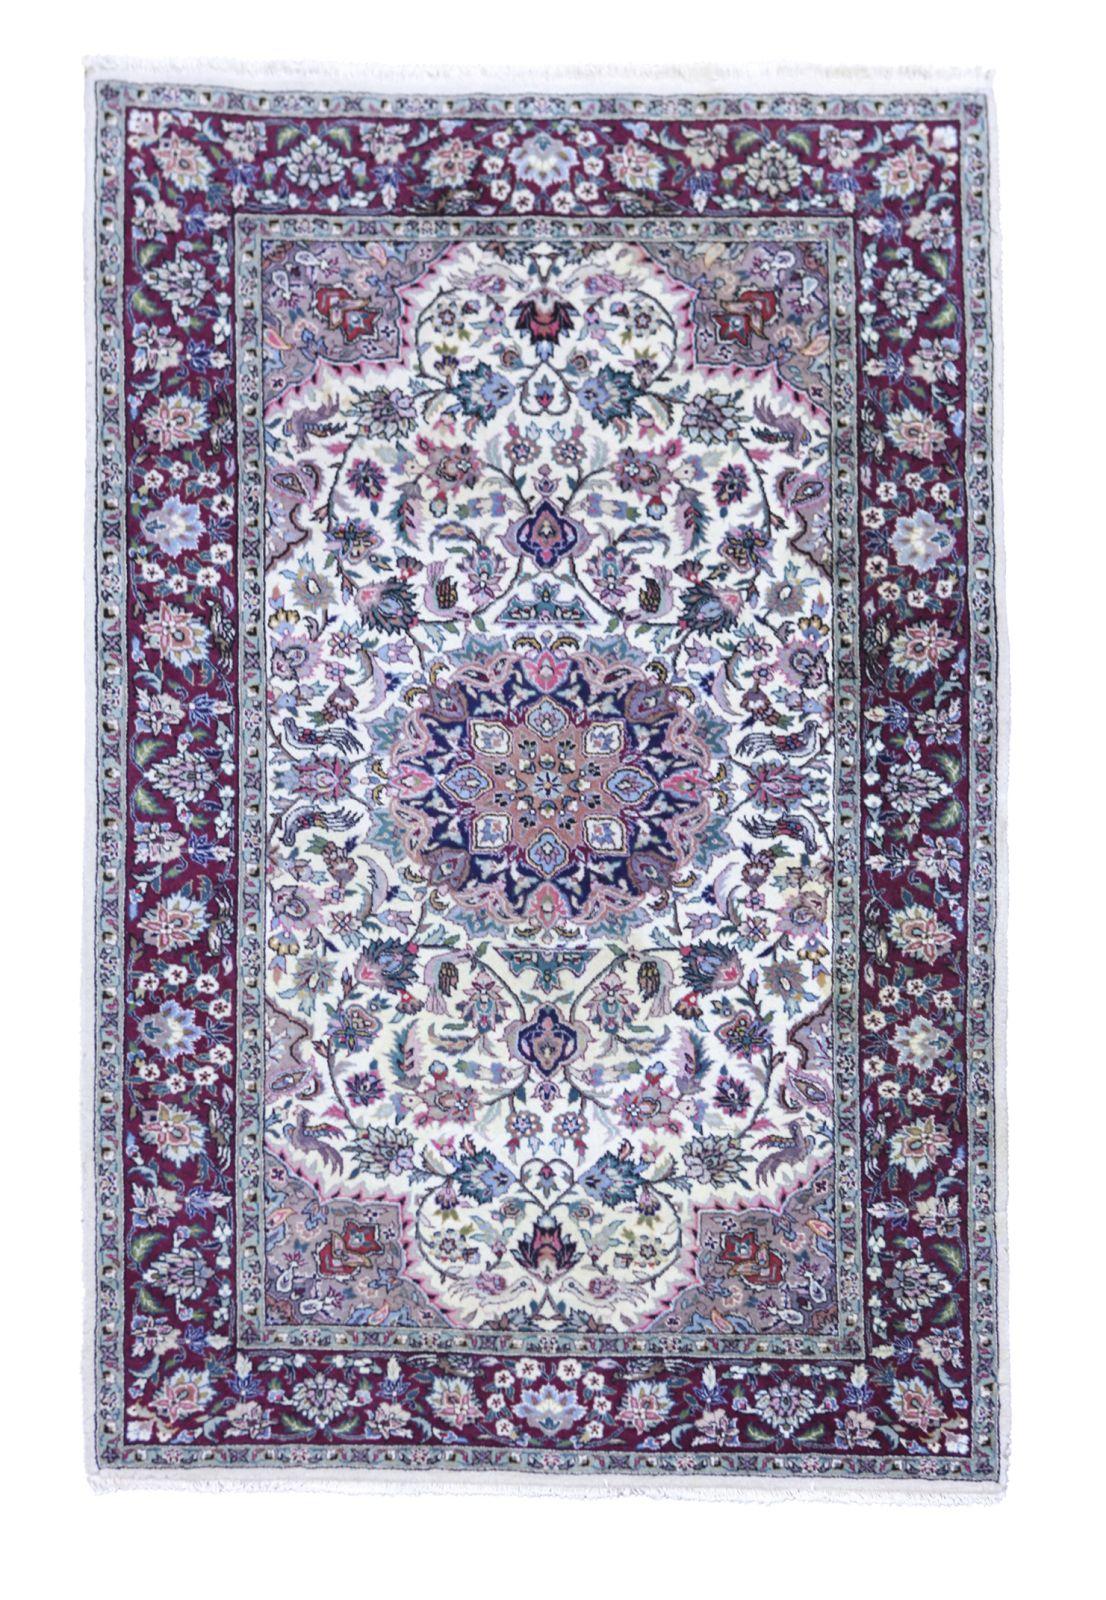 #84 Carpet Tabriz | Teppich TÄBRIS Image